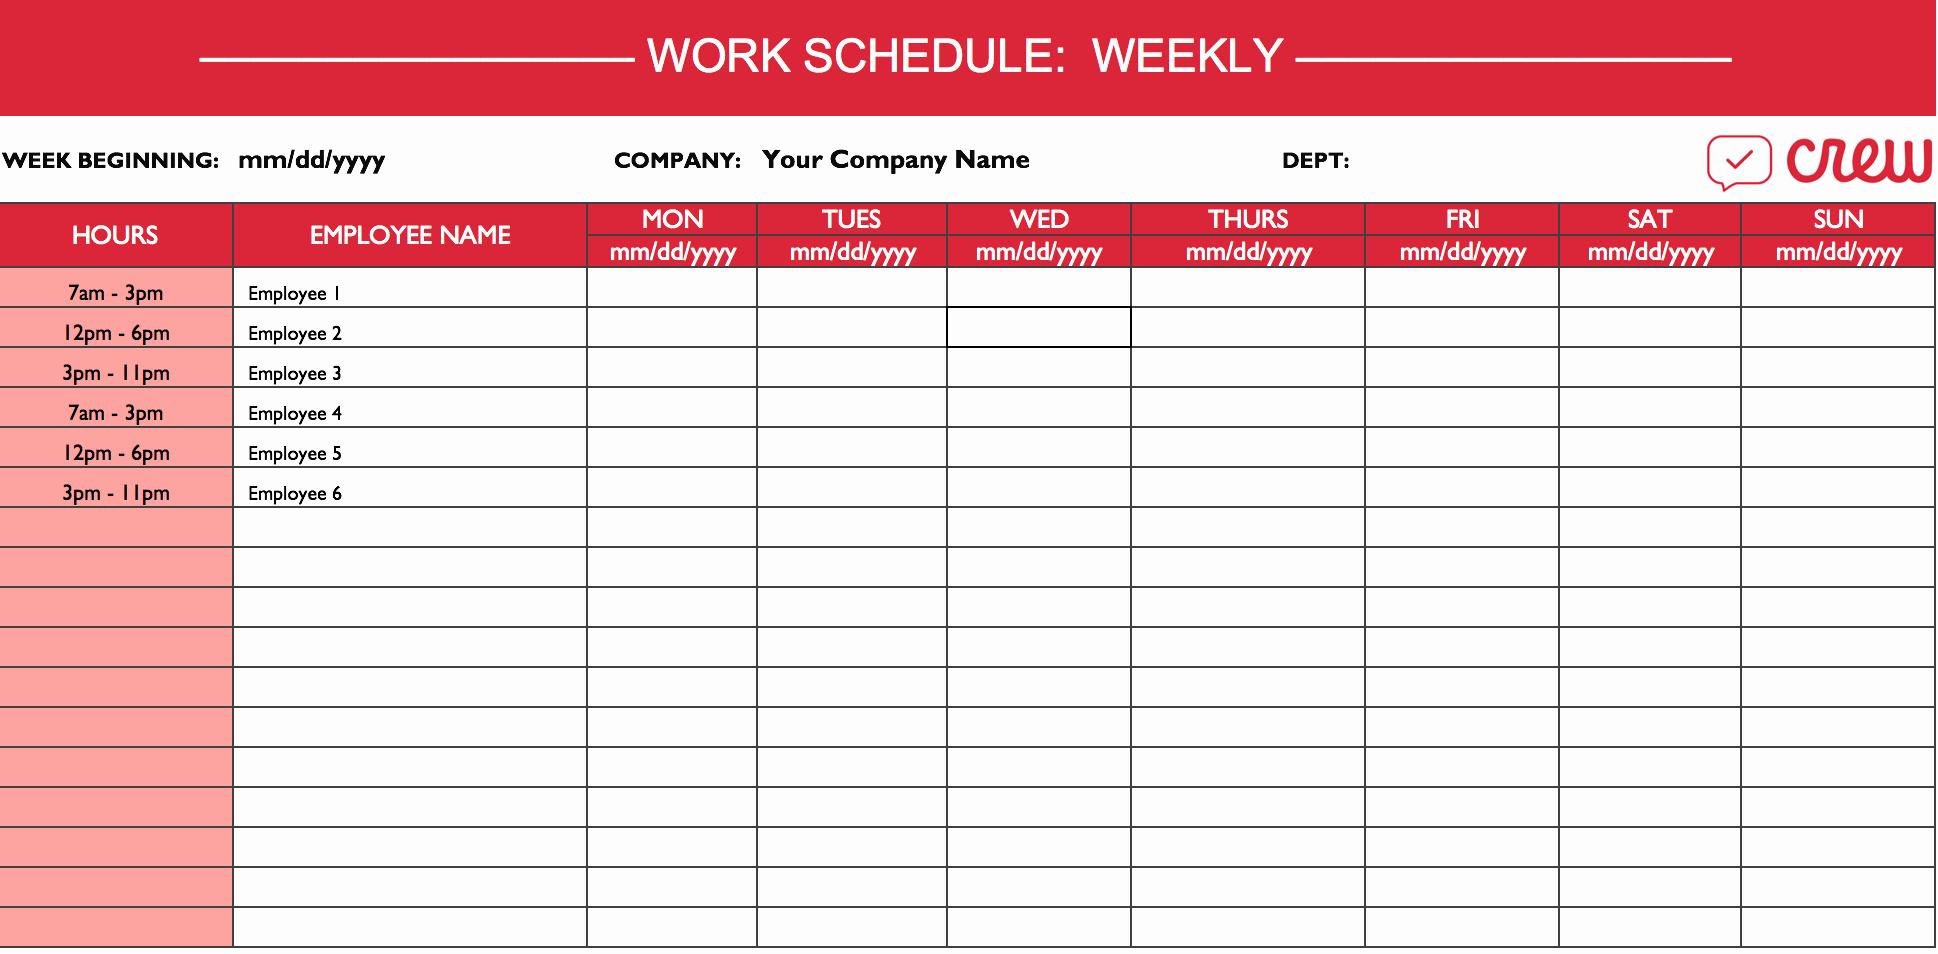 Weekly Work Schedule Template I Crew